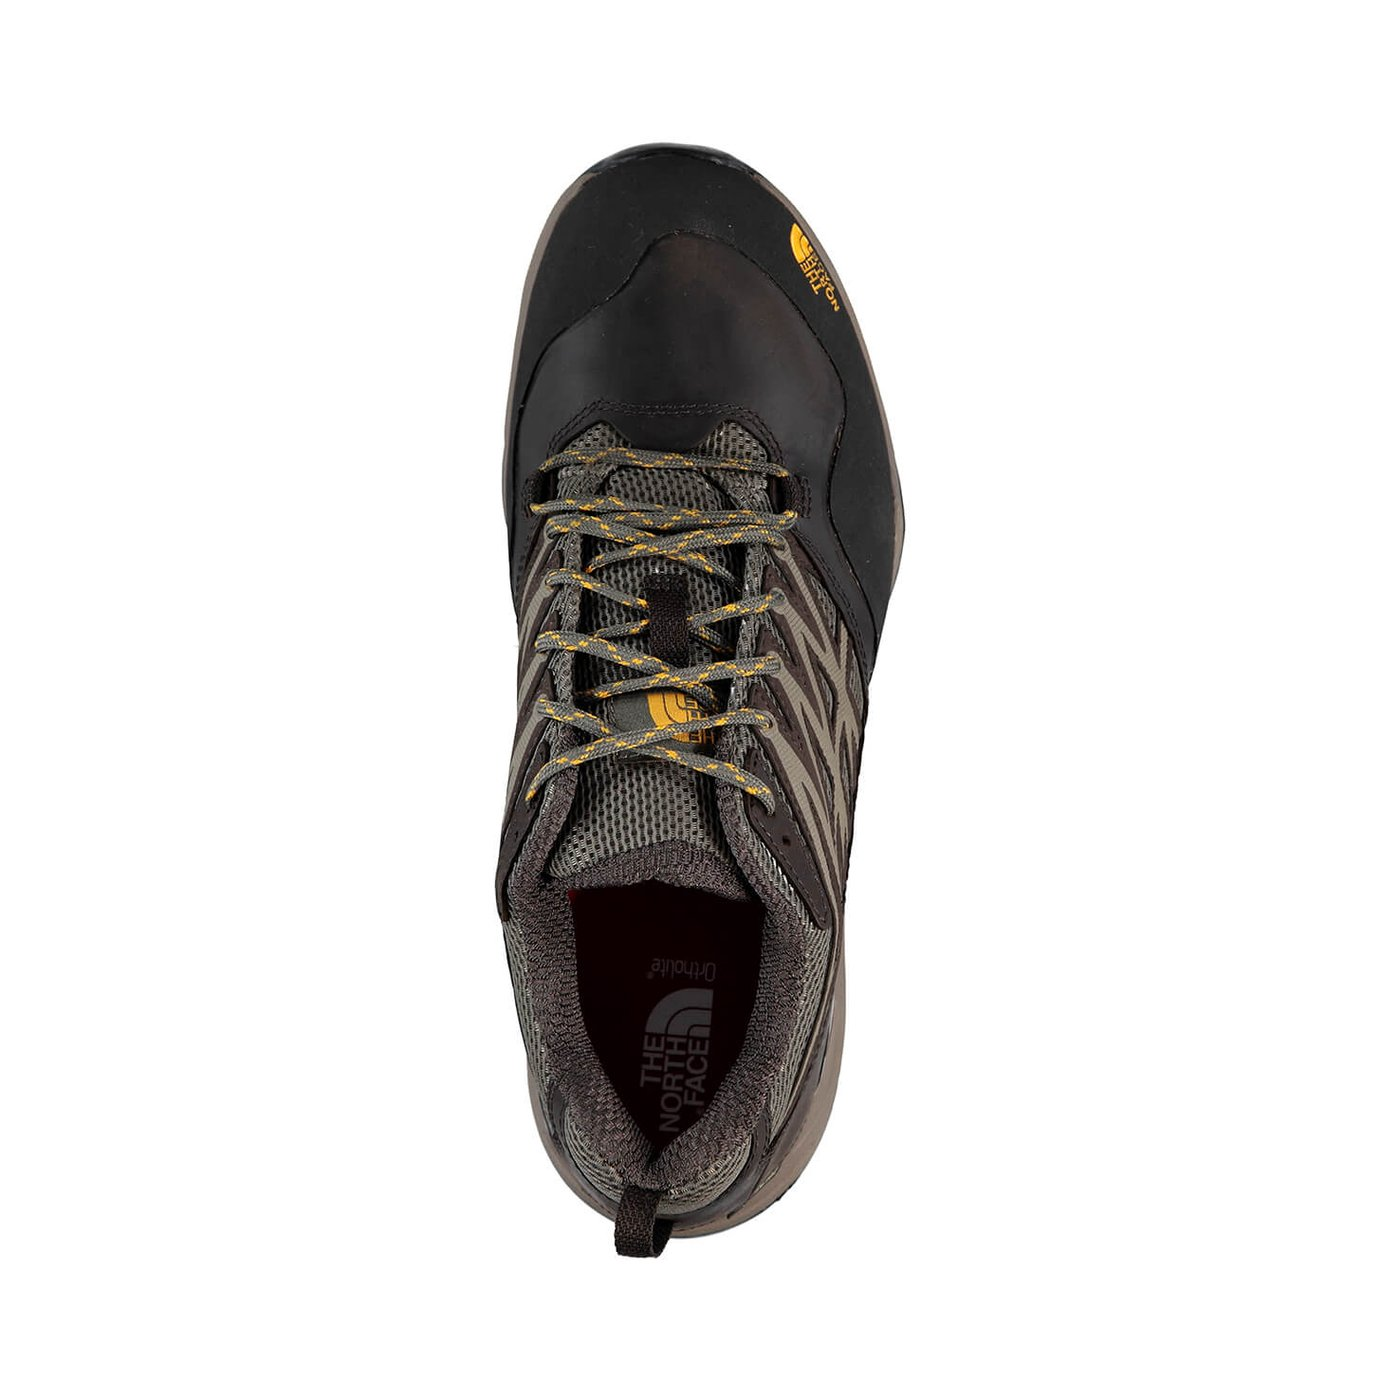 The North Face Hedgehog Hike Gore-Tex Erkek Kahverengi Spor Ayakkabı